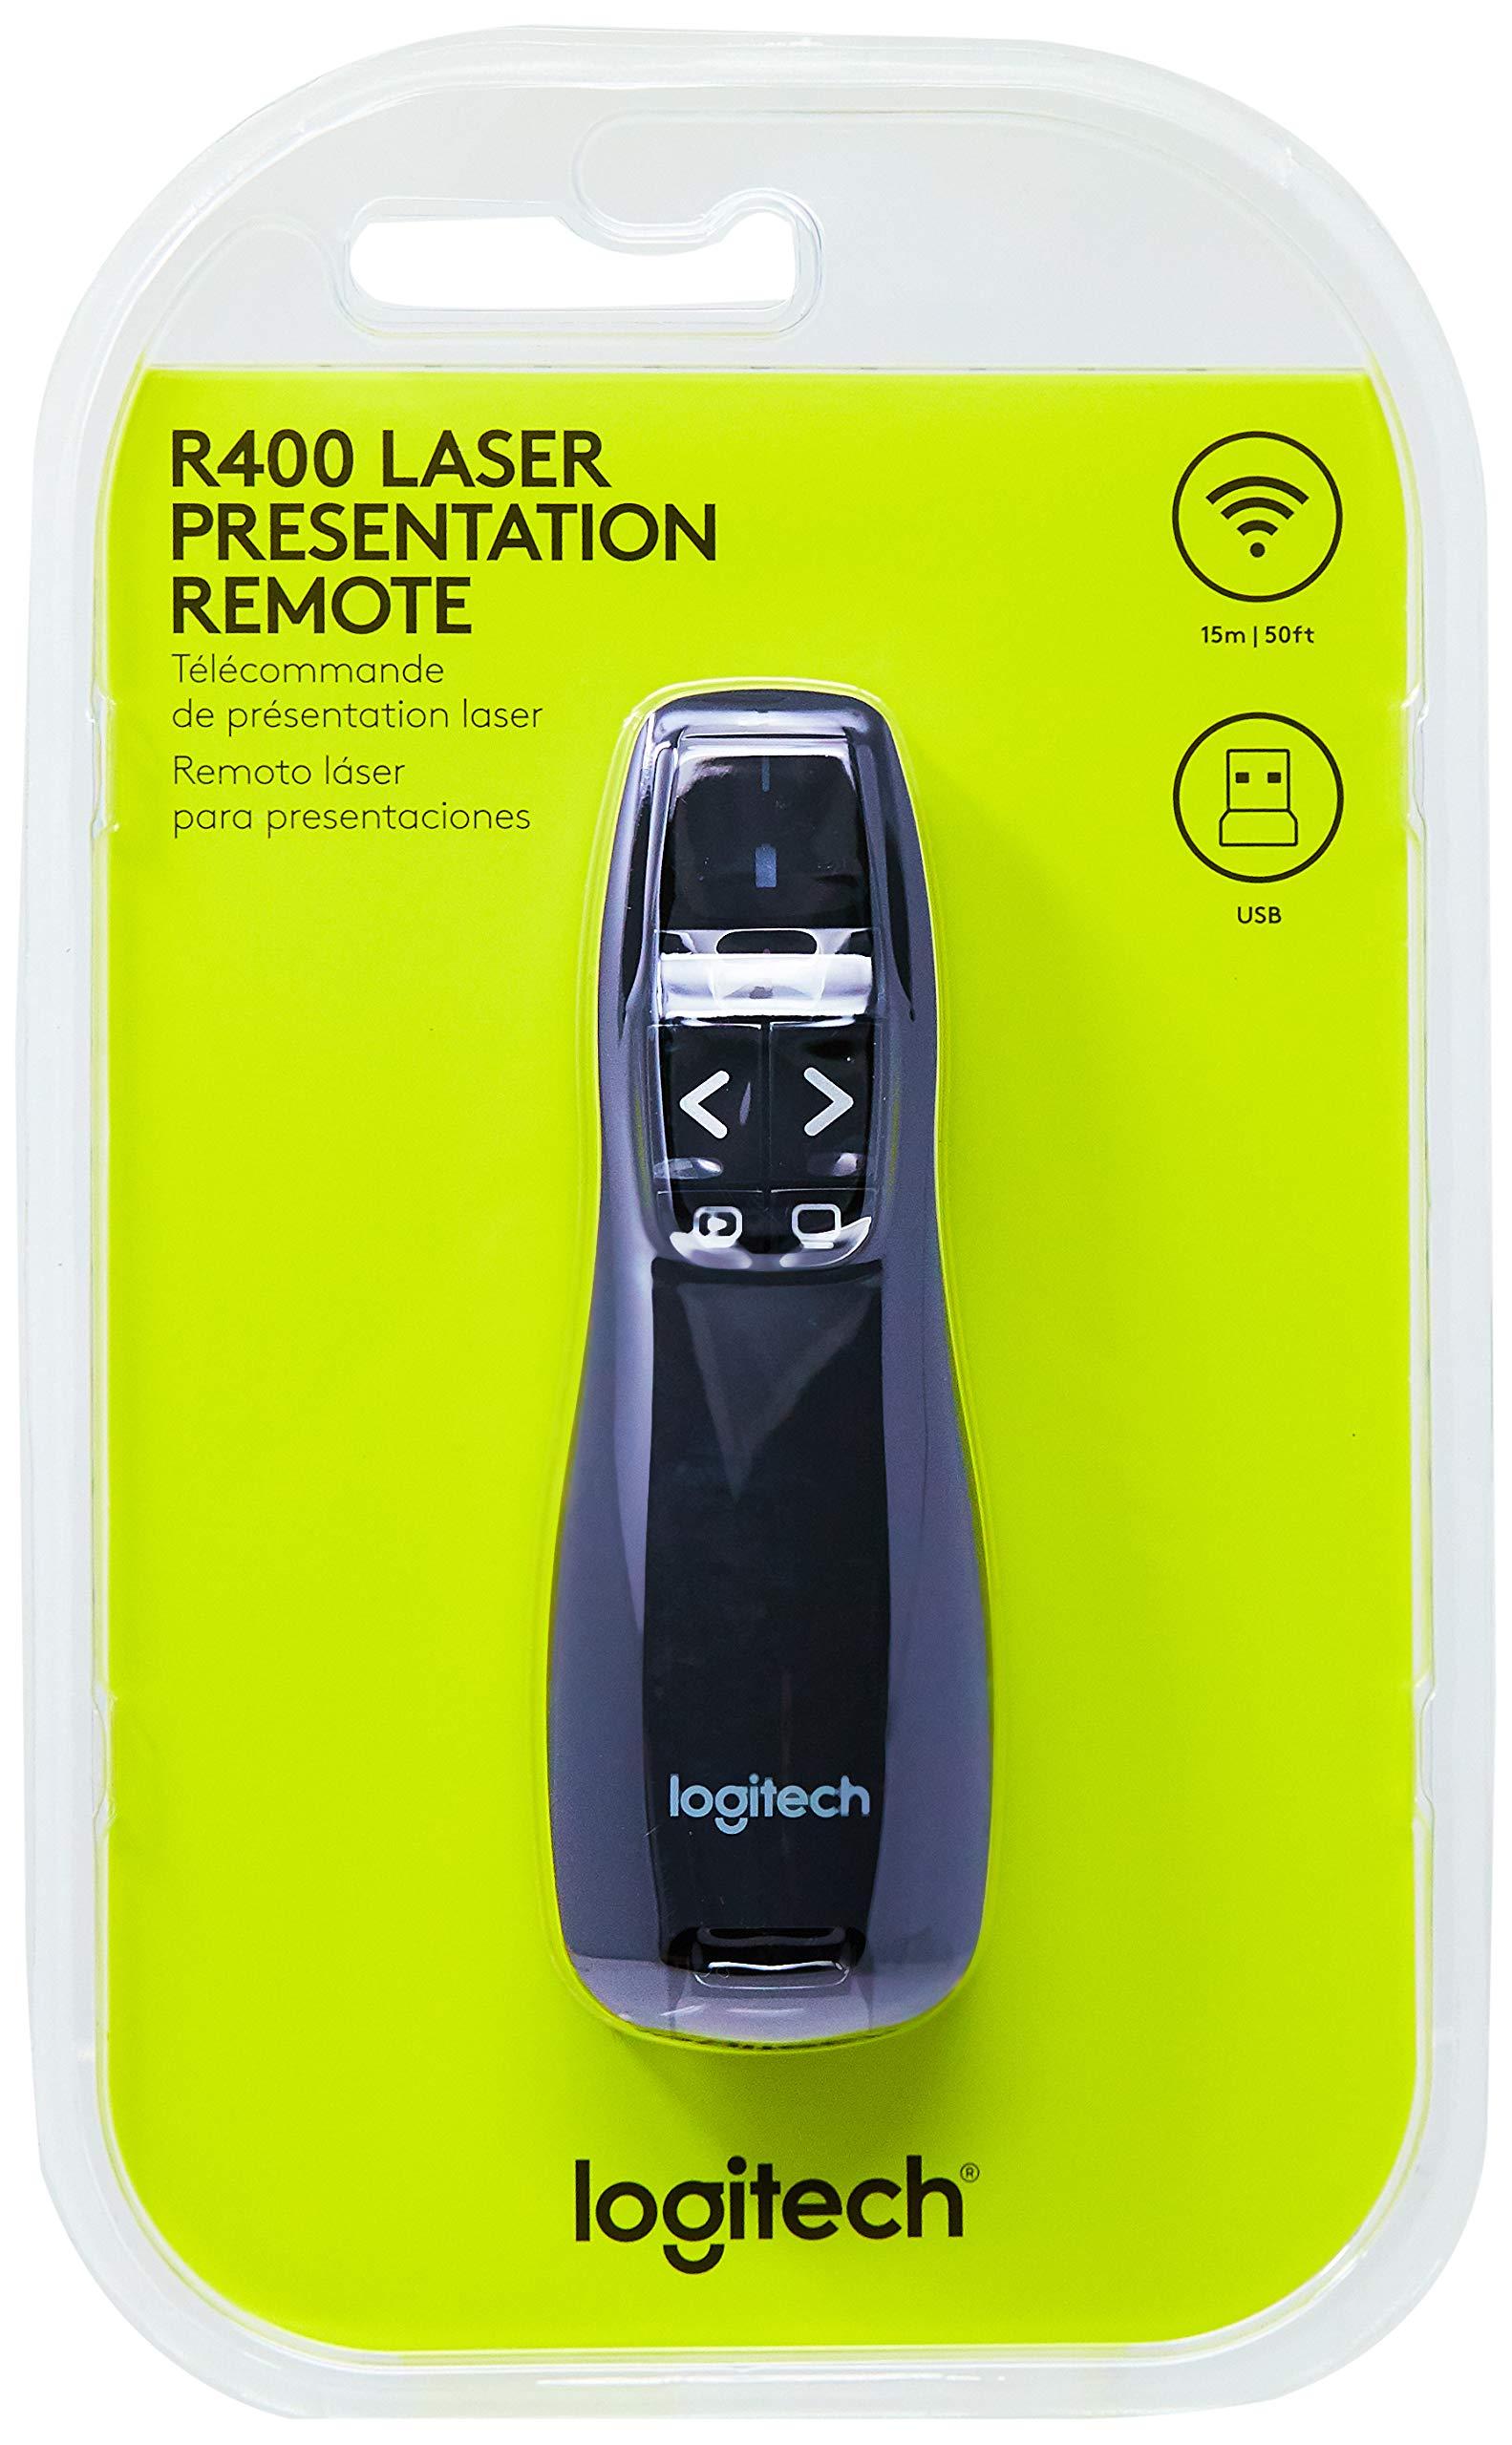 Logitech Wireless Presenter R400, Presentation Wireless Presenter with Laser Pointer by Logitech